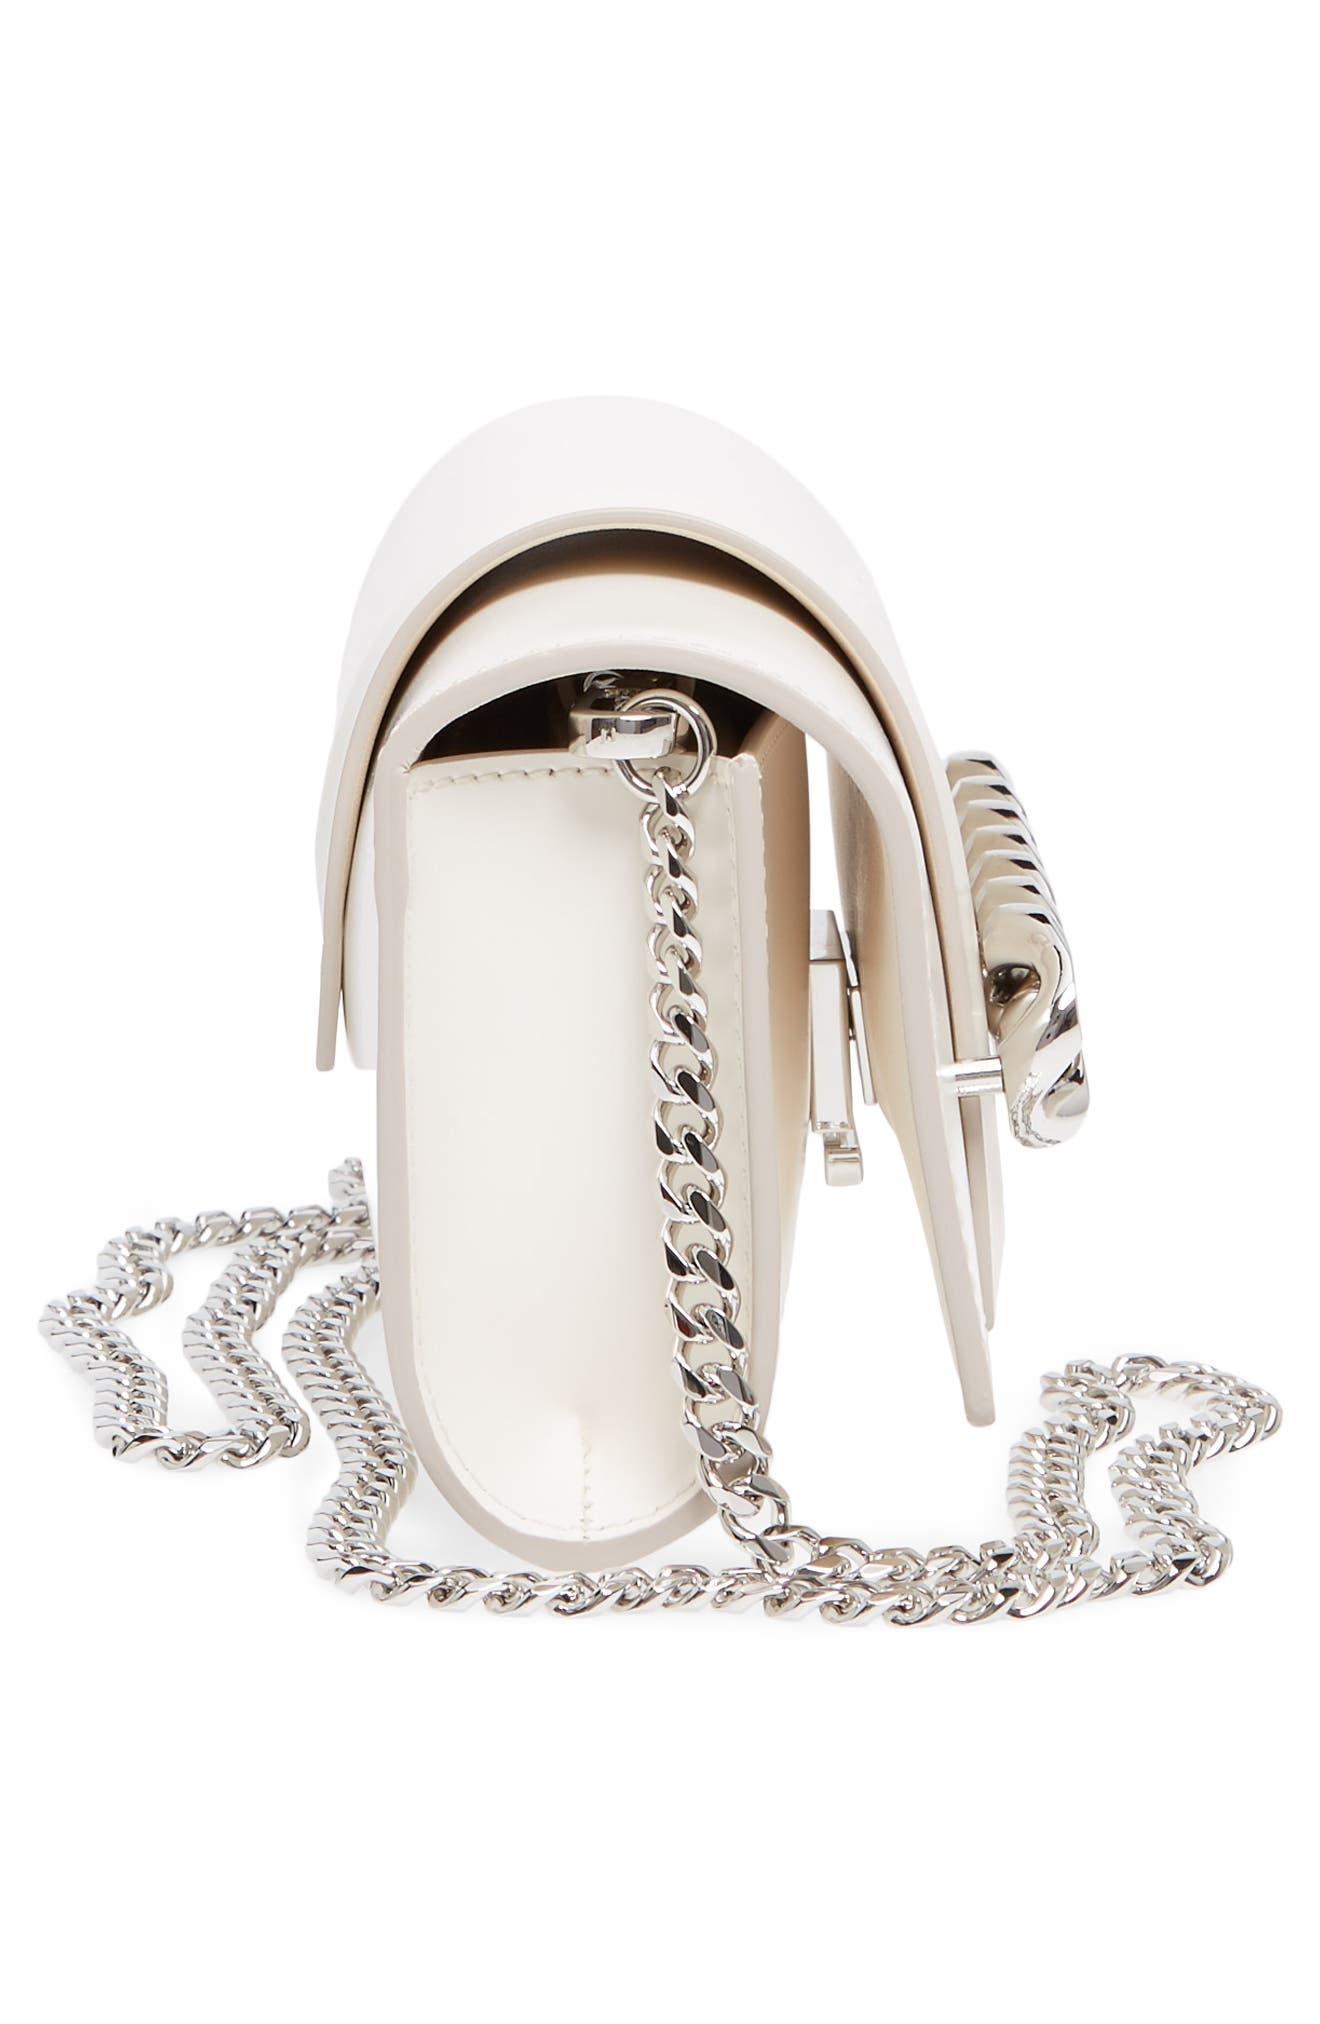 Mini Infinity Calfskin Leather Shoulder/Crossbody Bag,                             Alternate thumbnail 10, color,